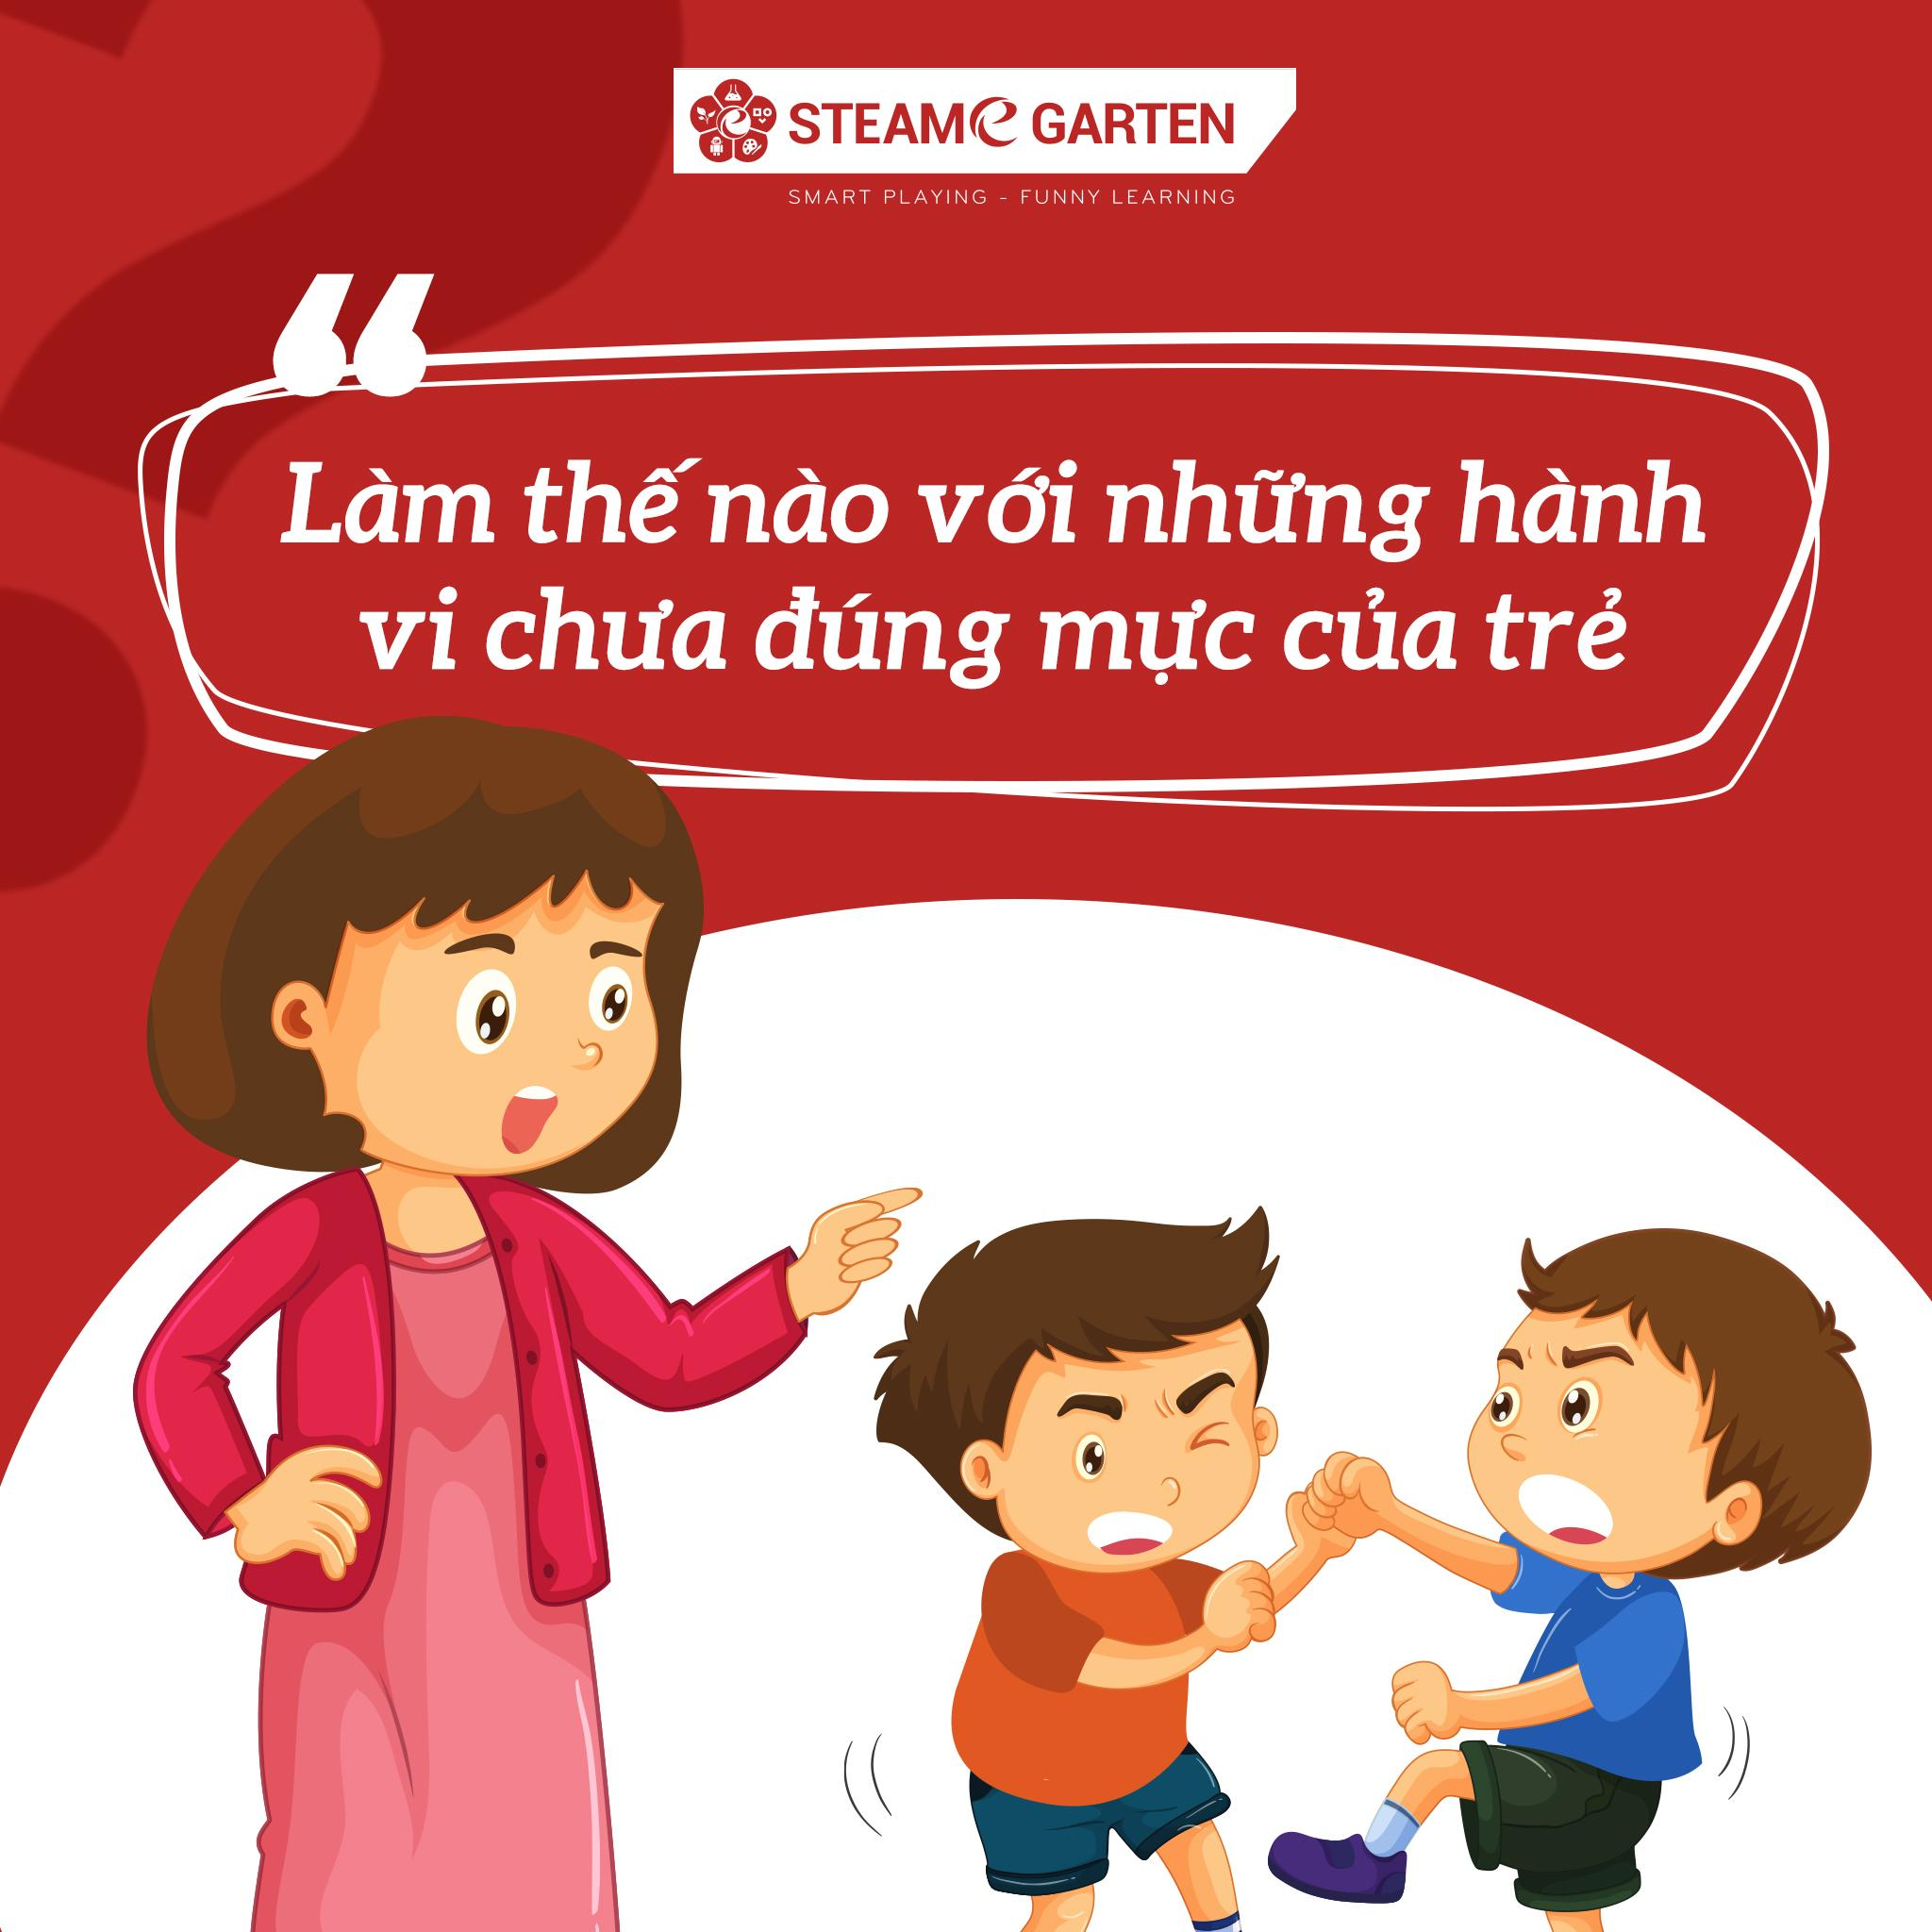 lam-the-nao-voi-nhung-hanh-vi-chua-dung-cua-tr-steame